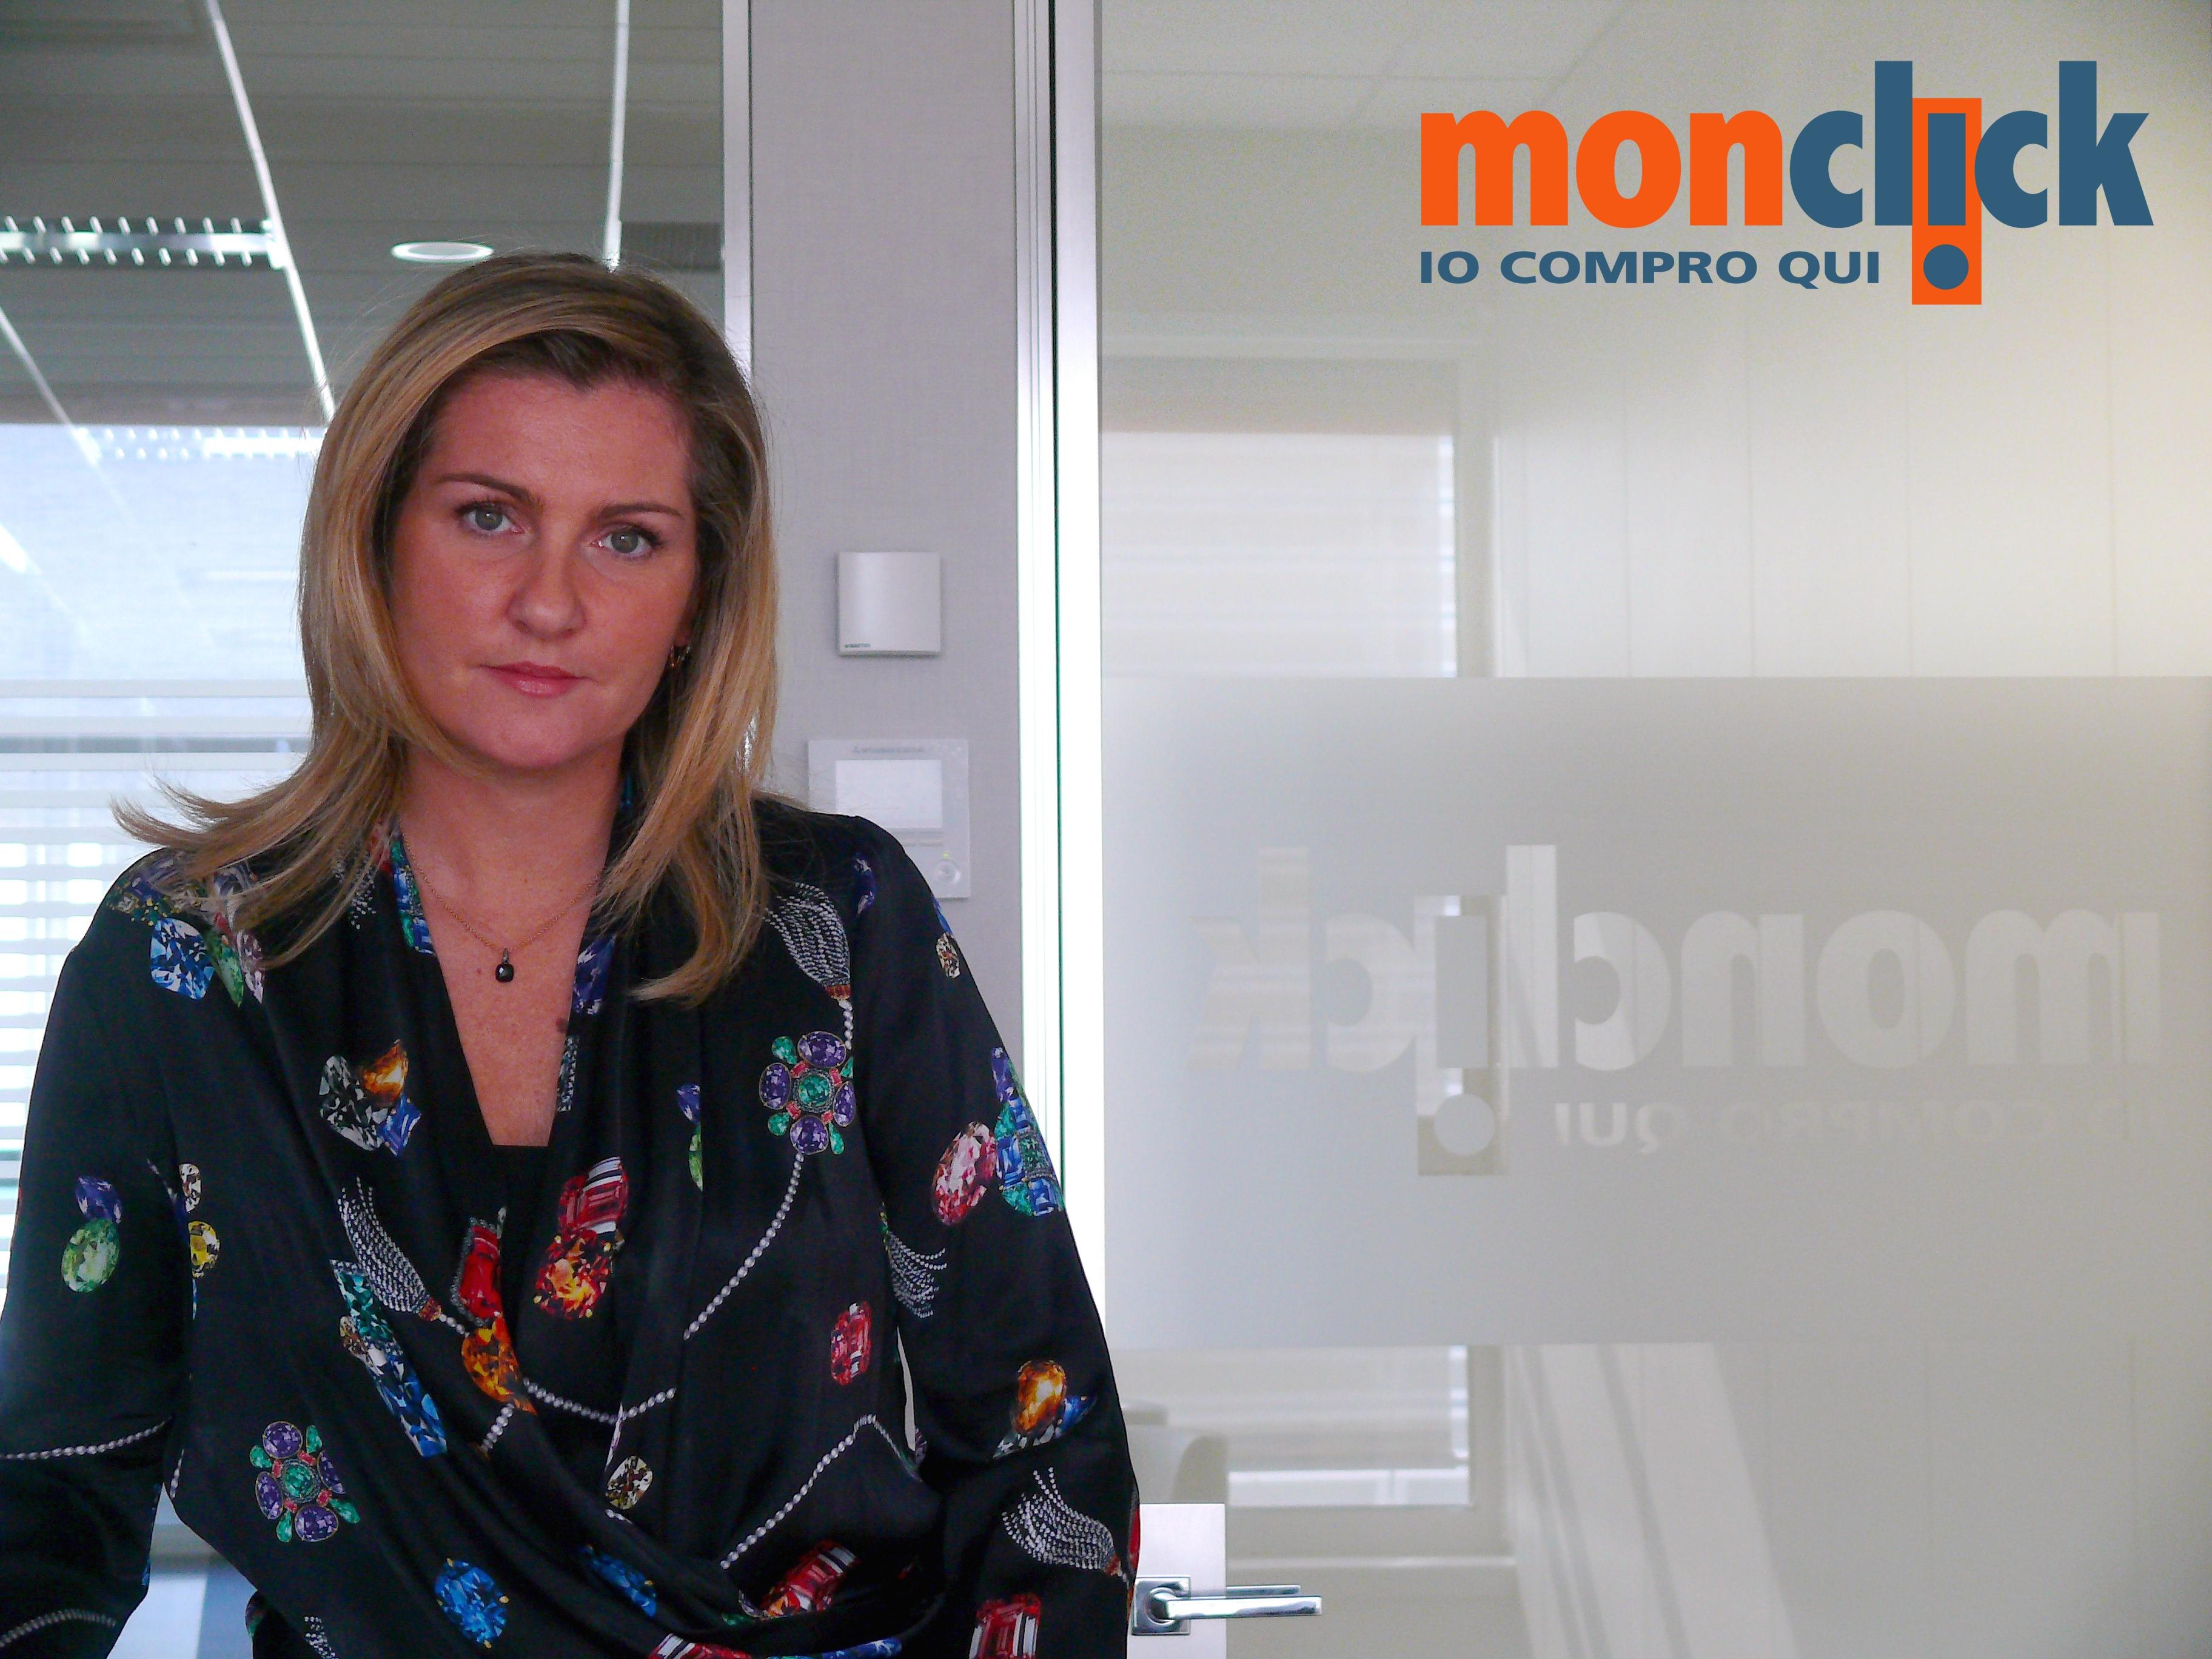 Federica Ronchi, Direttore Generale di Monclick